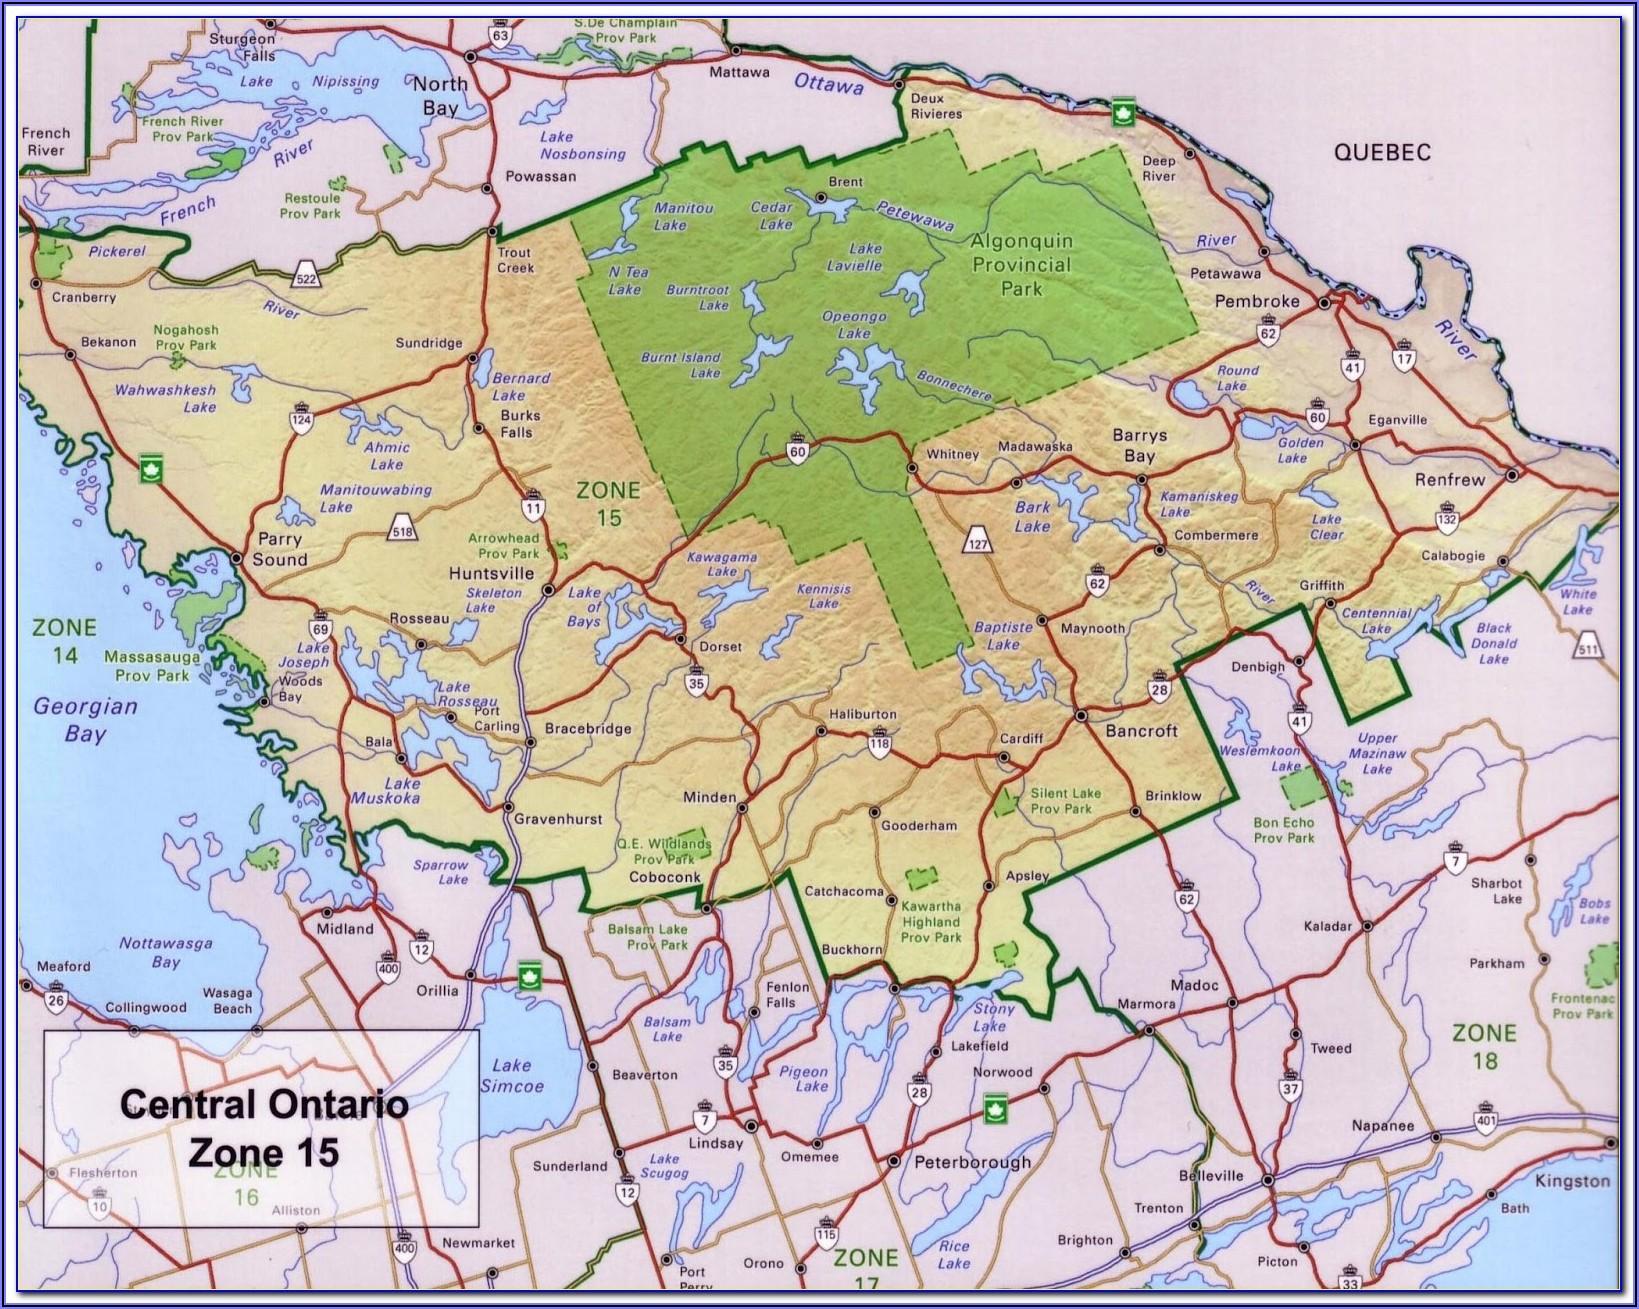 Fishing Hot Spots Maps Ontario